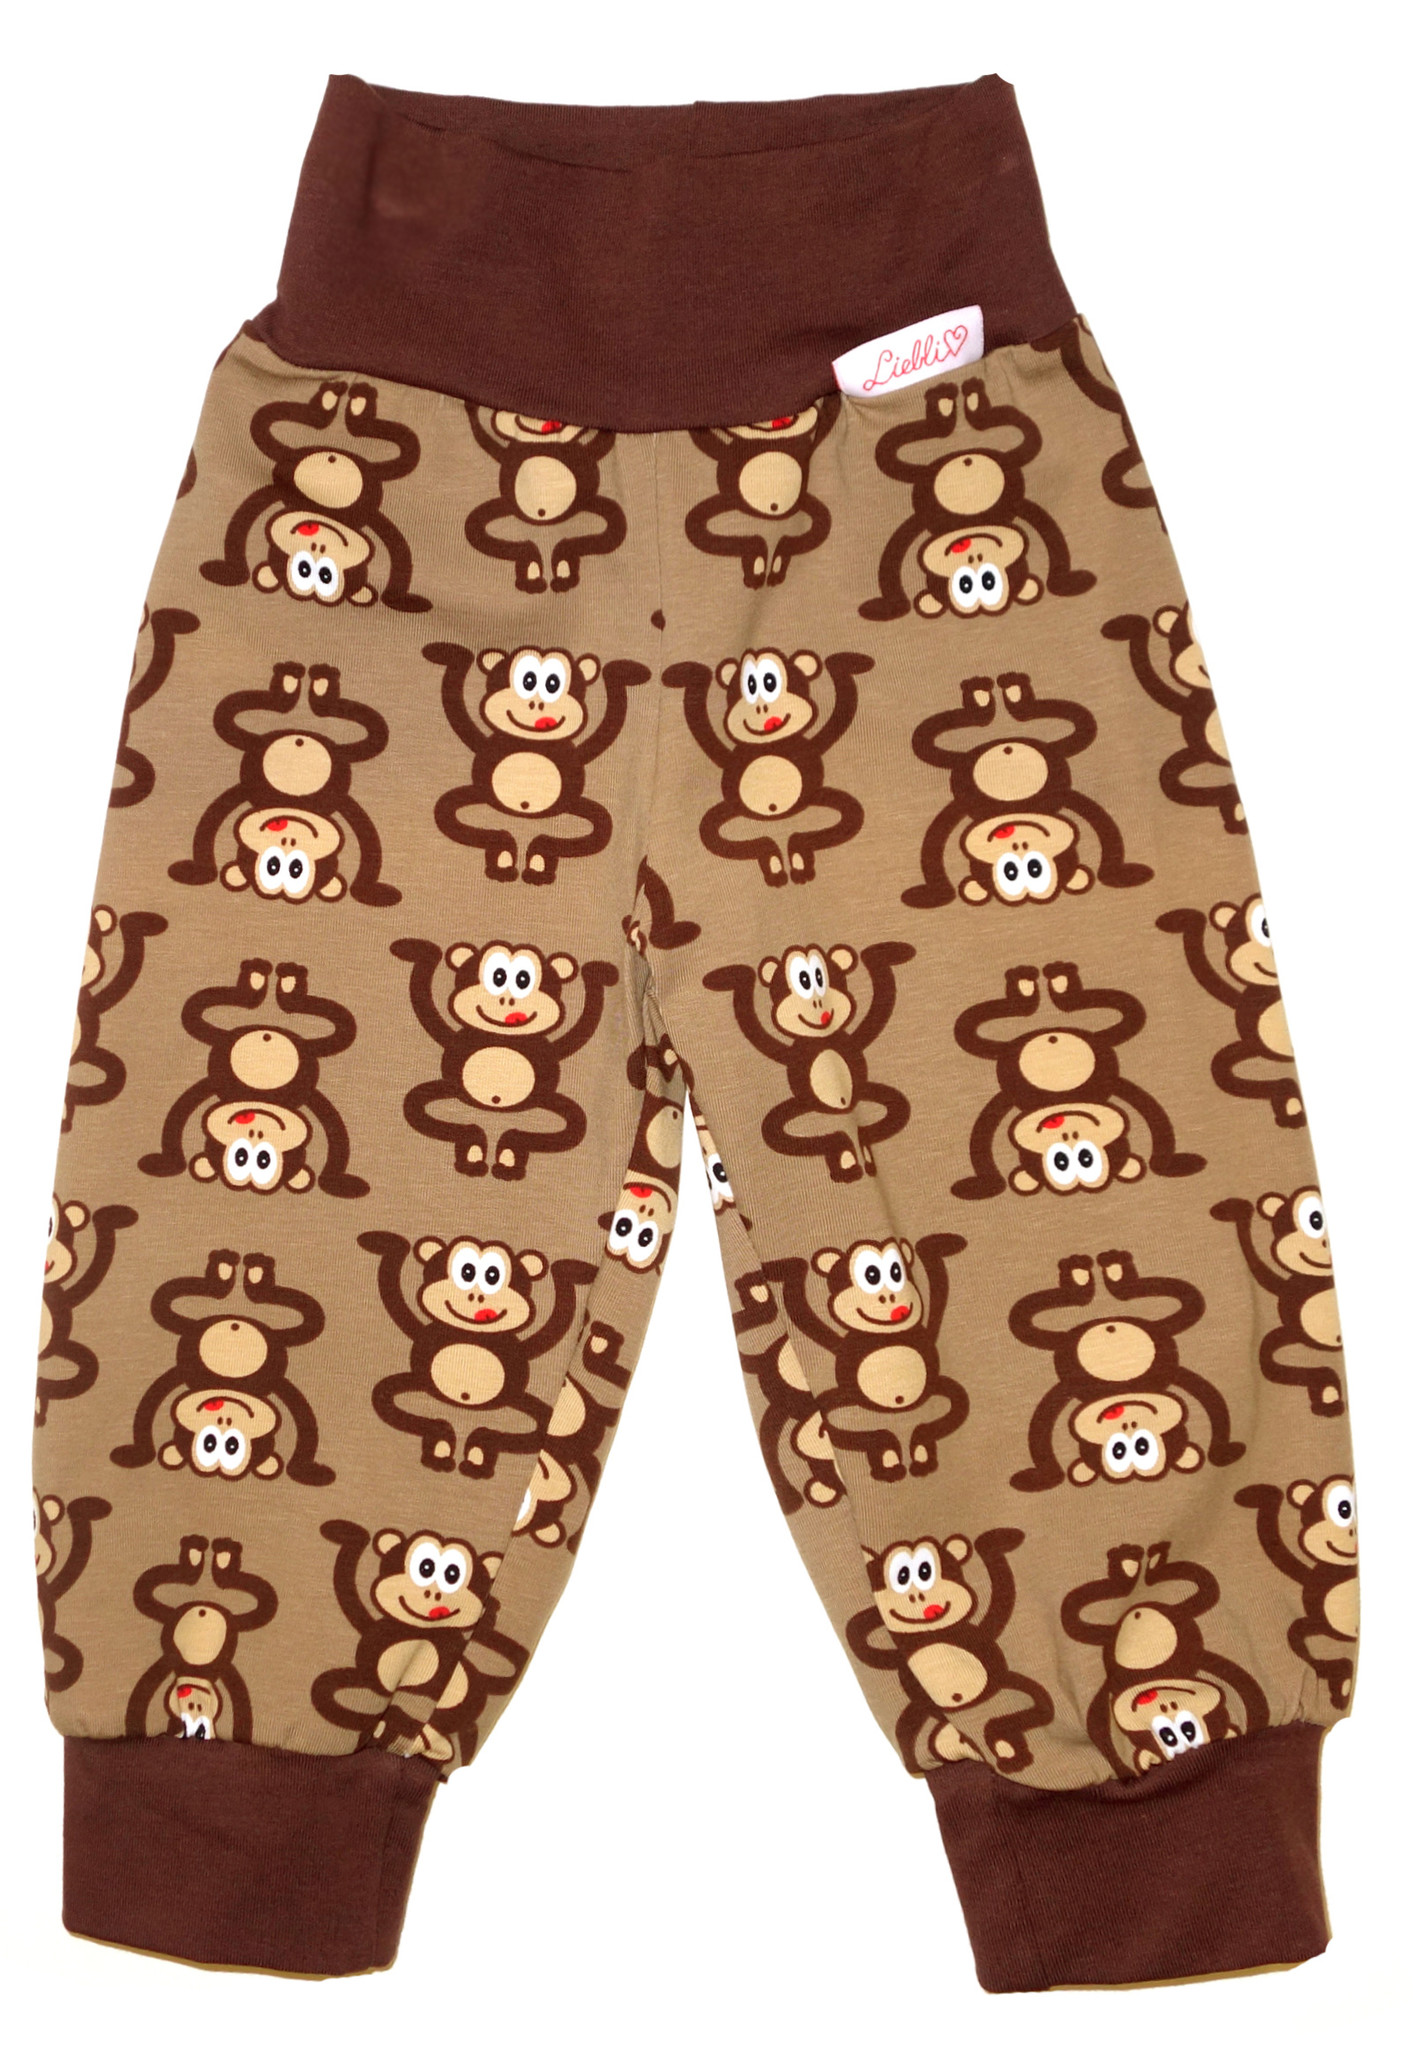 Kinderhose Affen braun